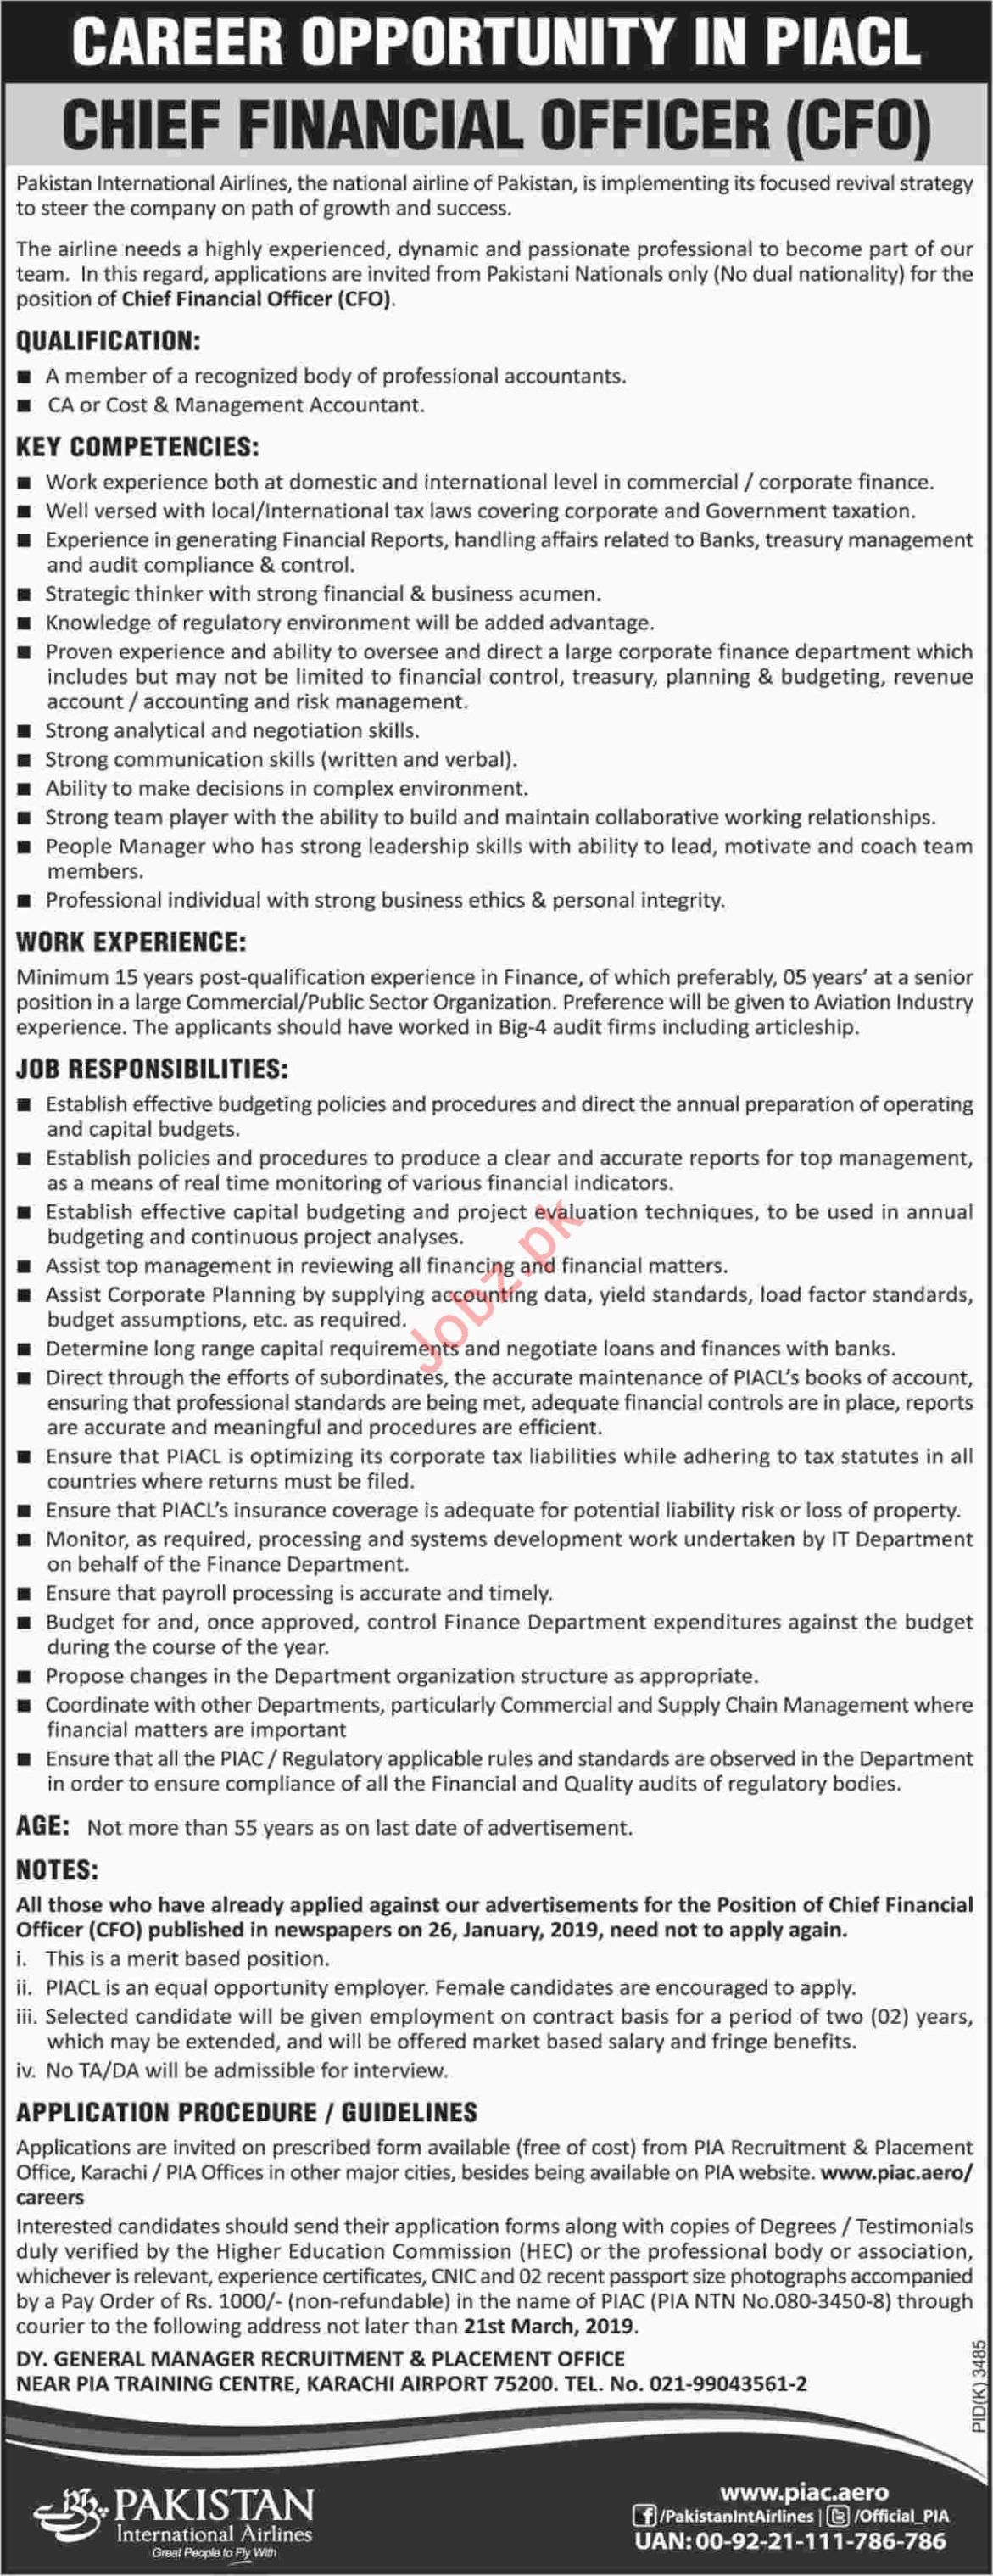 PIACL Pakistan International Airlines Job 2019 in Karachi